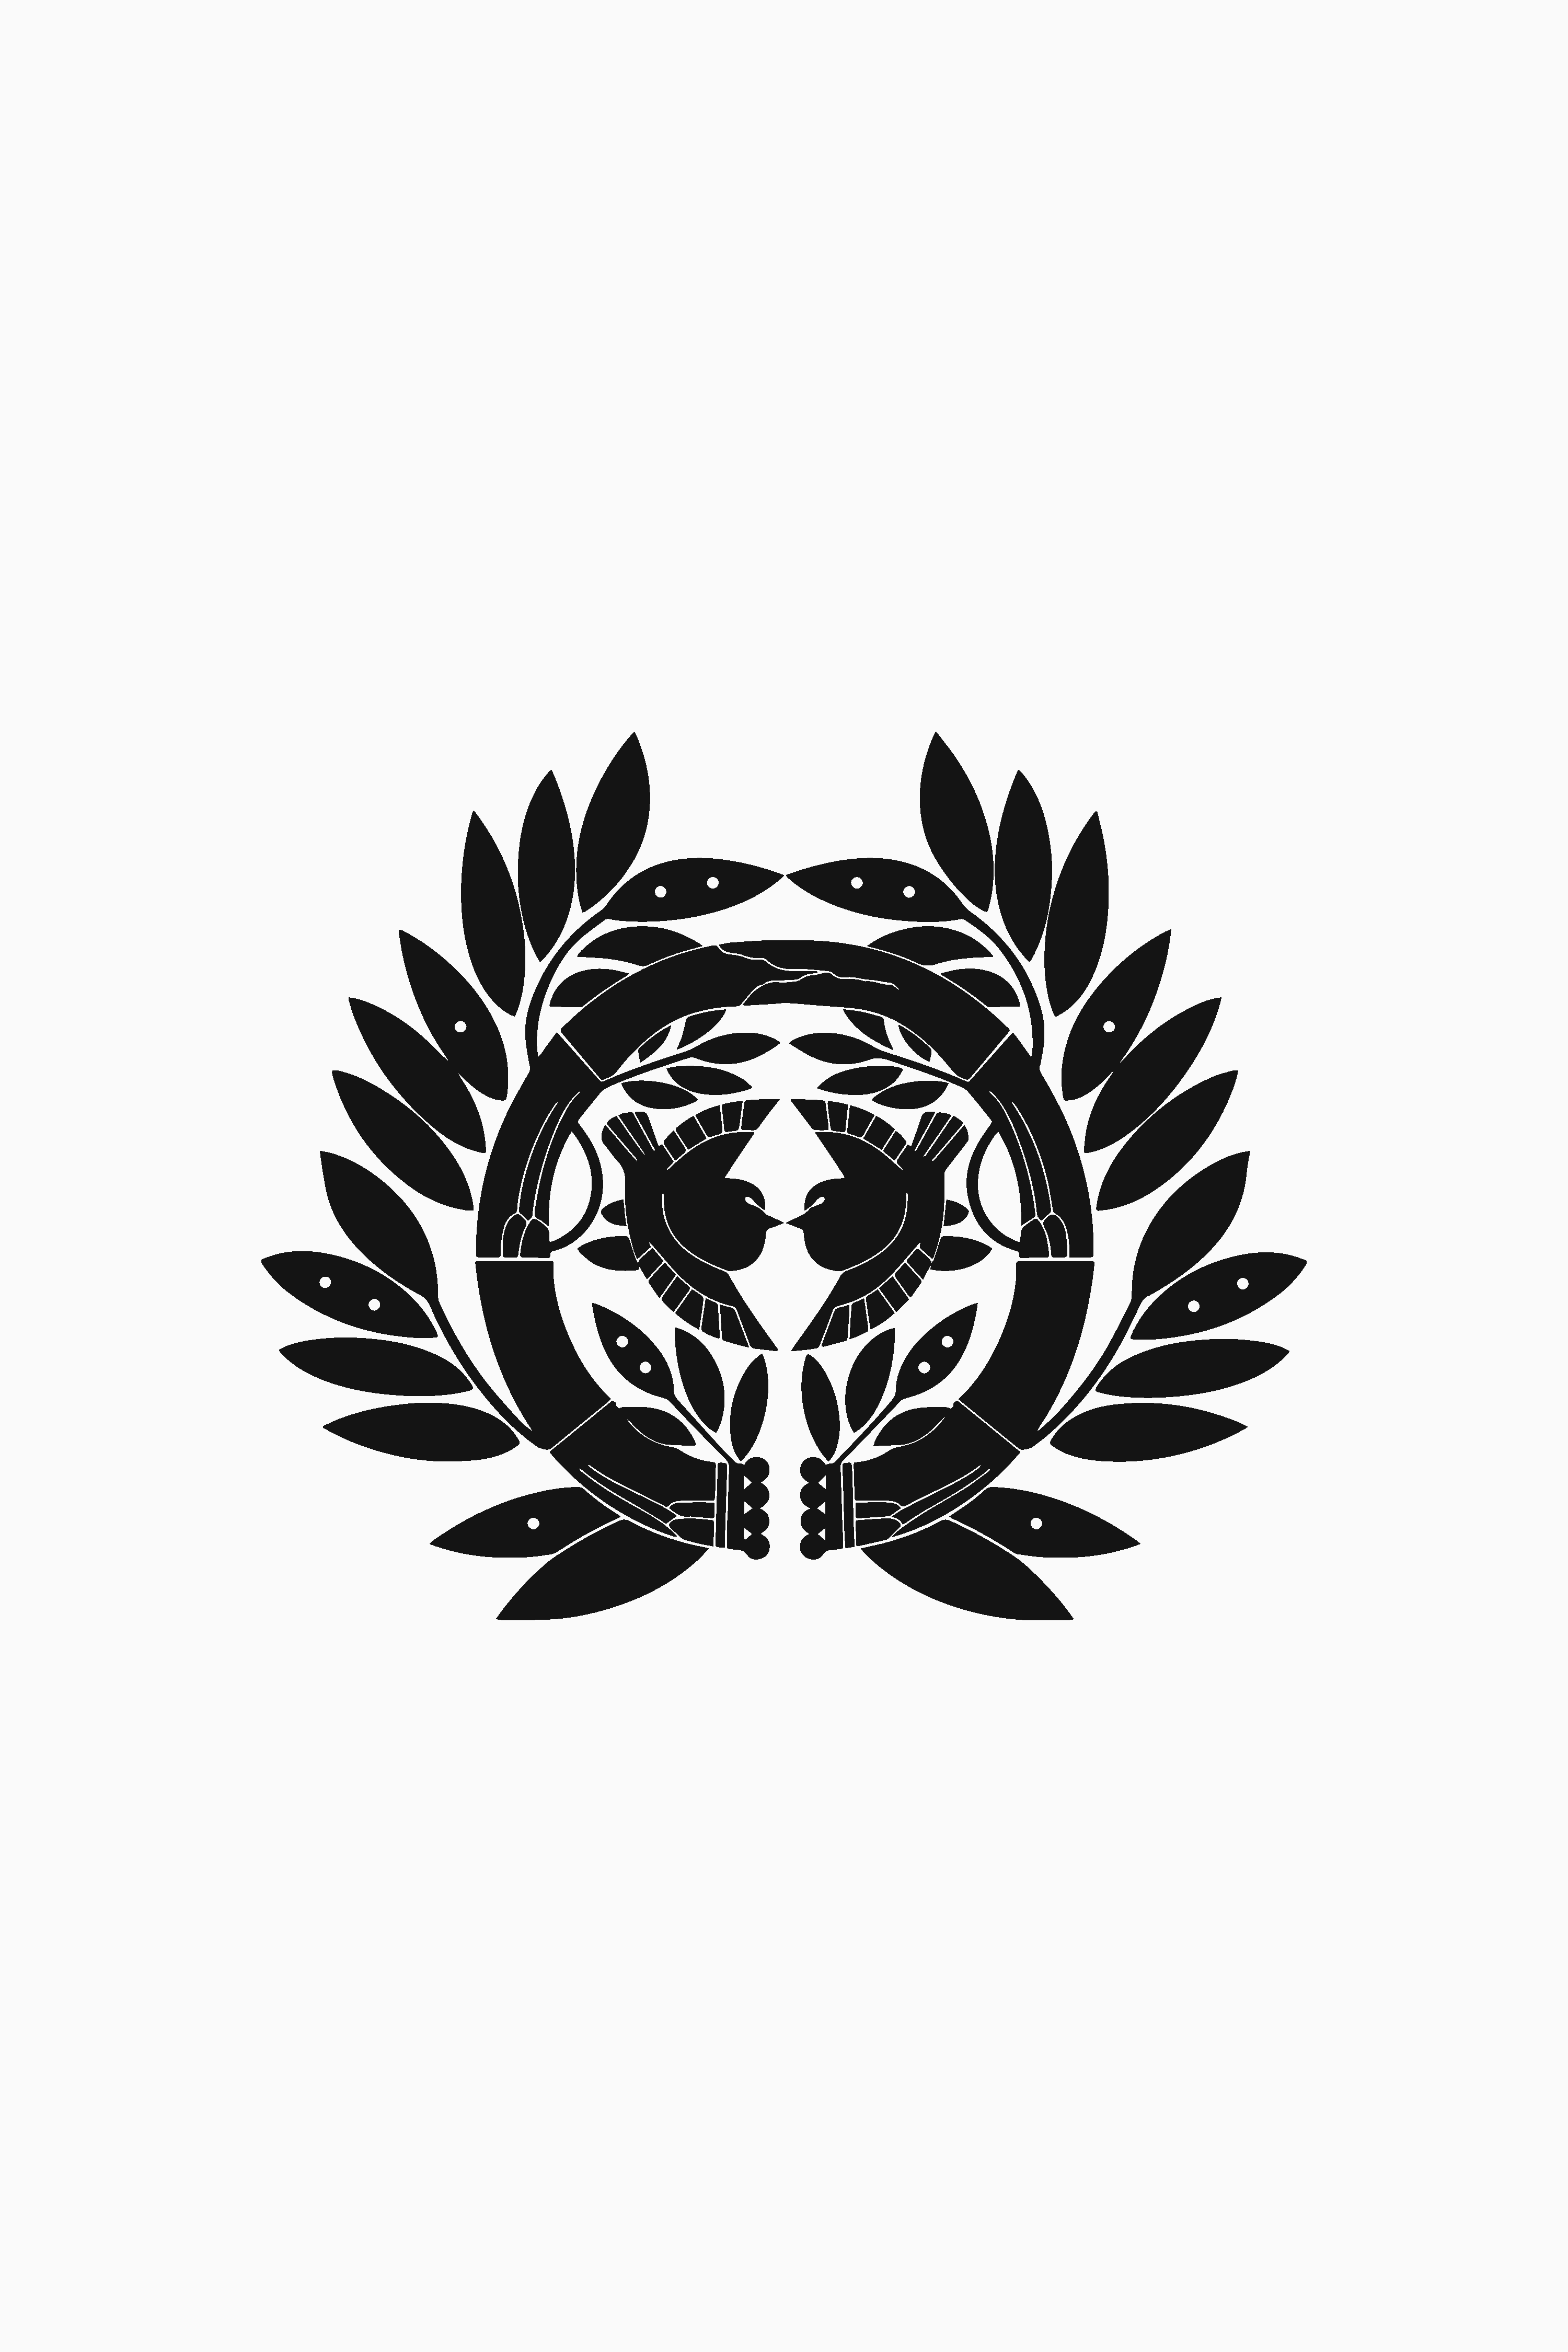 Date Clan Black Mon Kamakura Period Clan Samurai